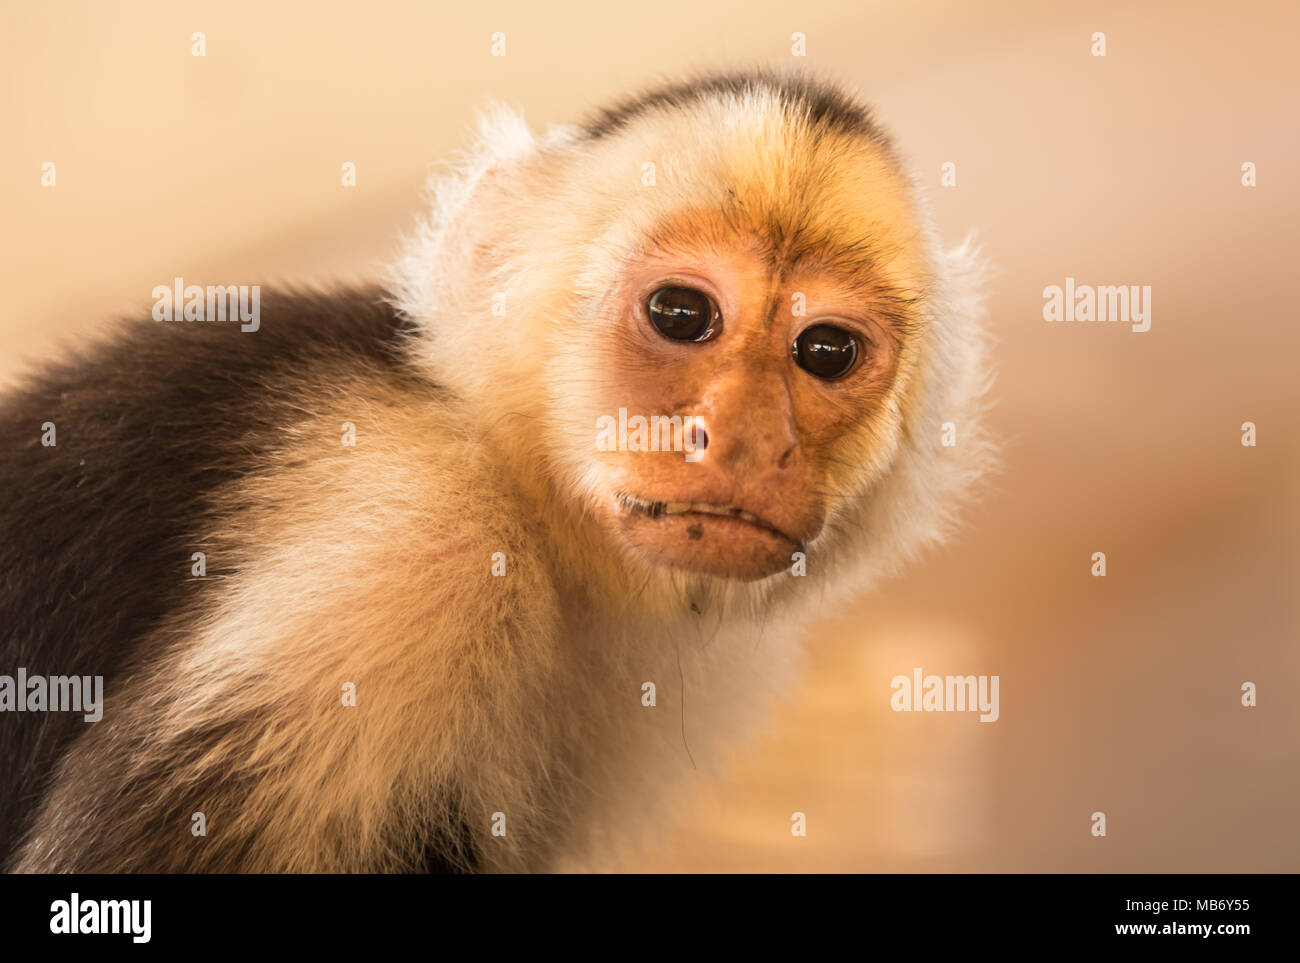 Cute Capuchin Monkey Looking At Camera Stock Photo